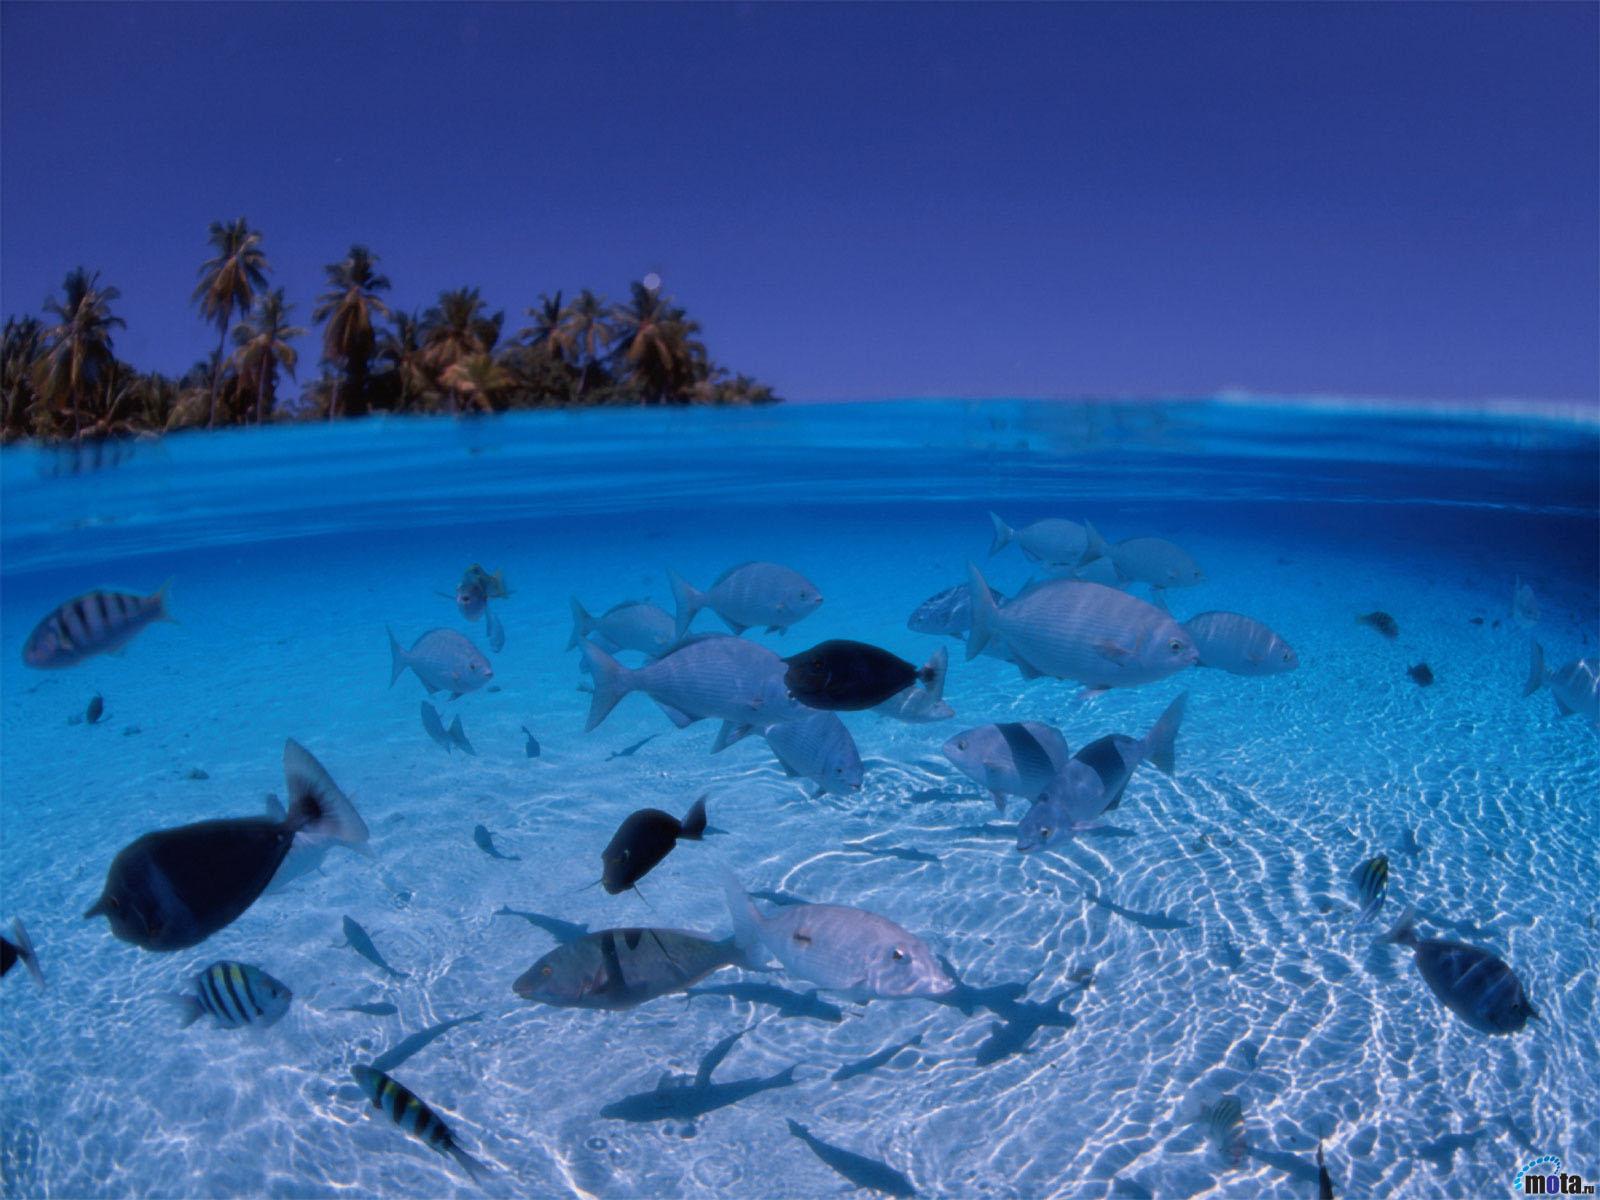 Wallpaper tropics blue ocean fish palm Marine fish in shallow 1600x1200